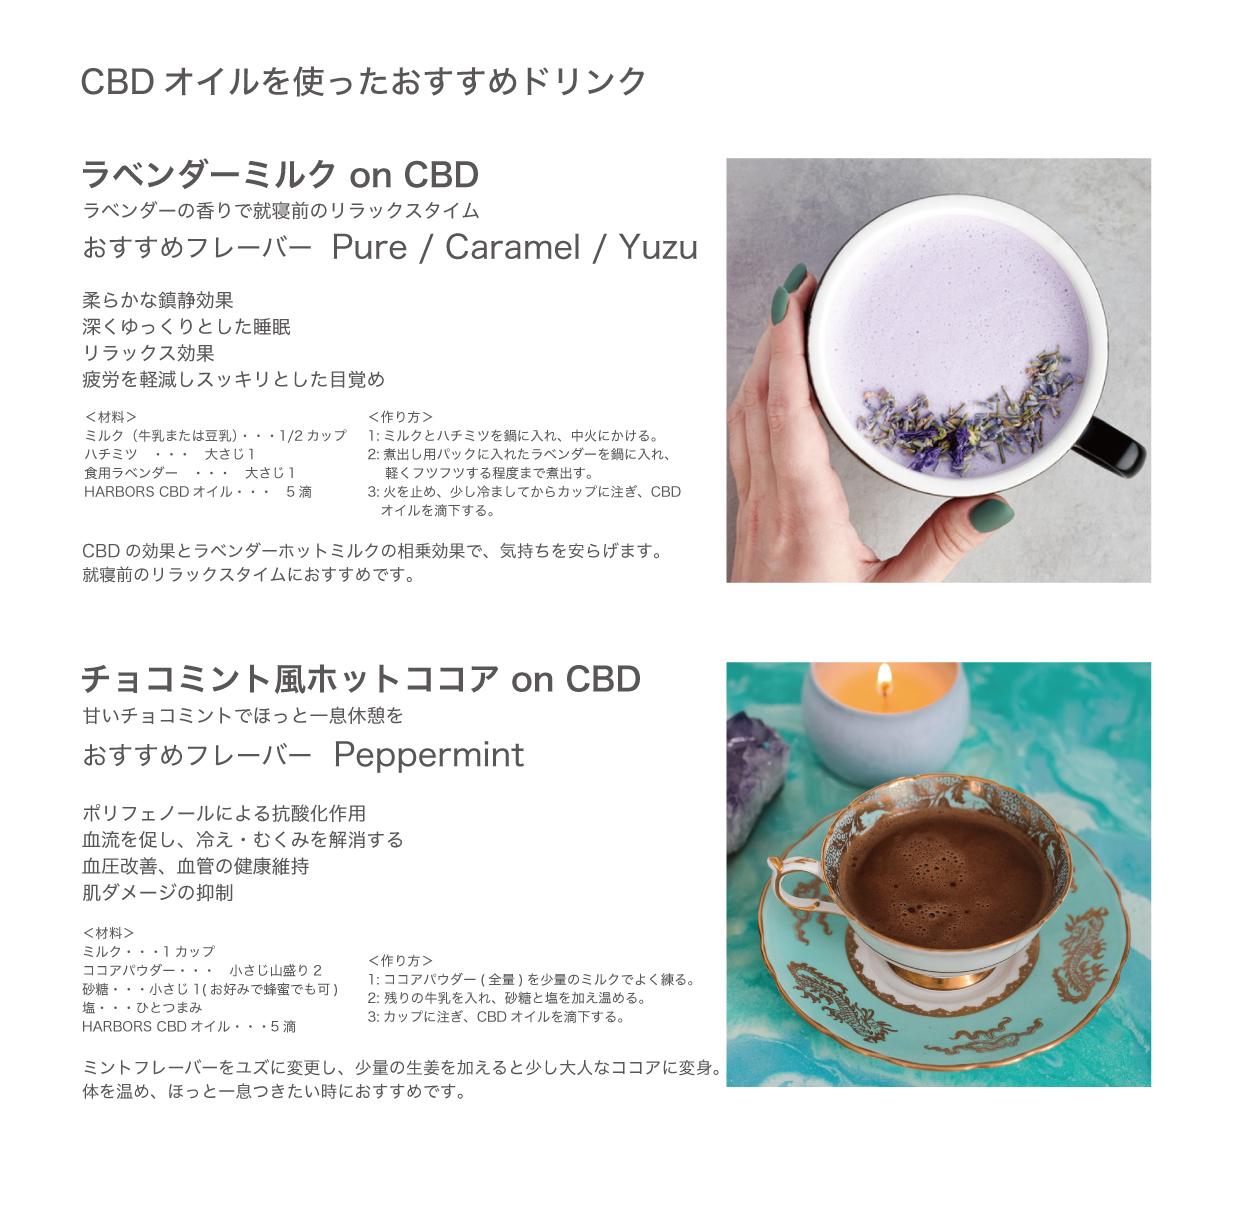 CBD製品の使い方